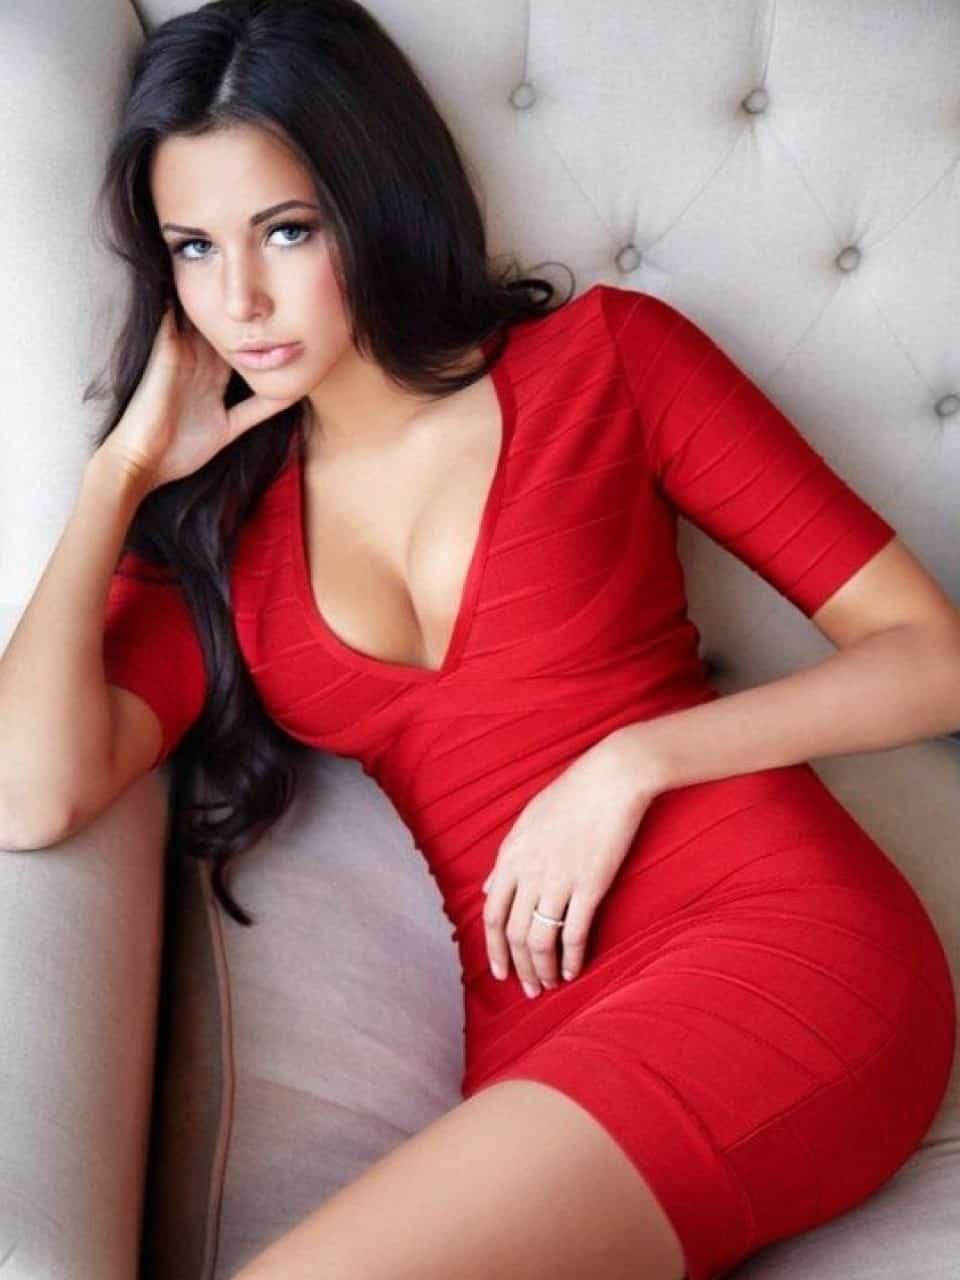 Qatar escort girl Hiranur